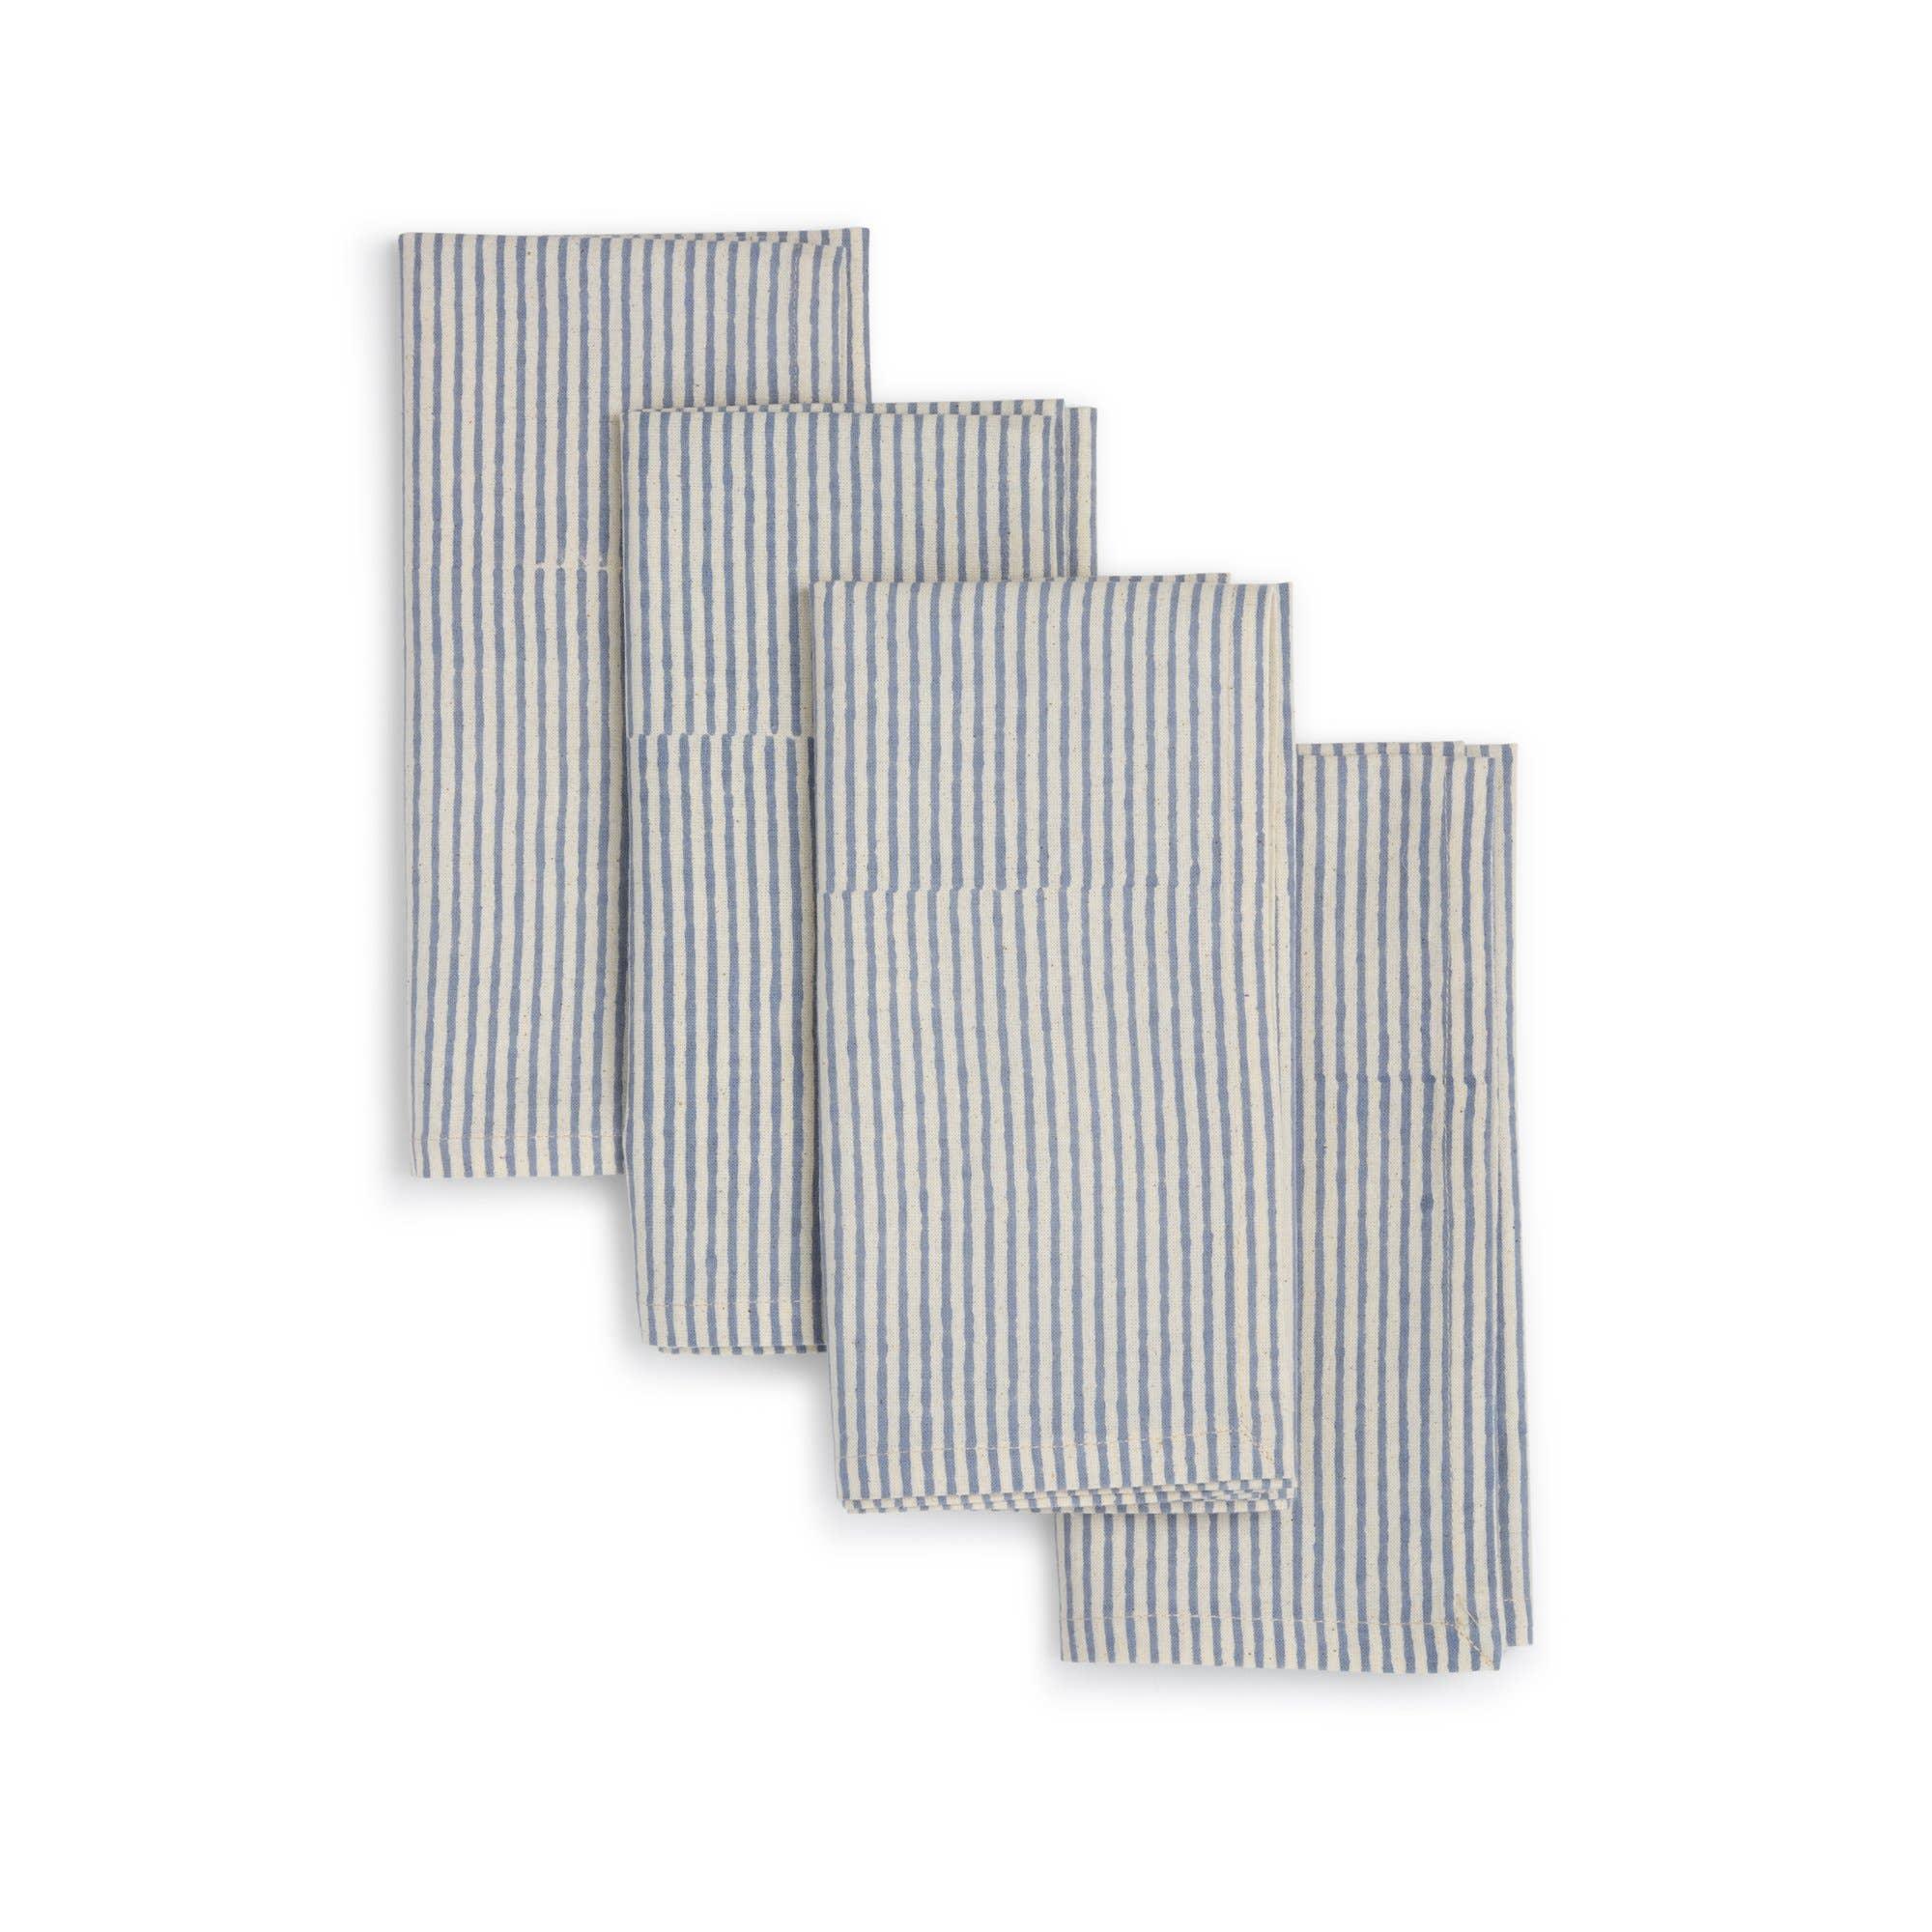 BLUE MOON Napkin  (set of 4), Hand Block Printed Cotton | Trada Marketplace